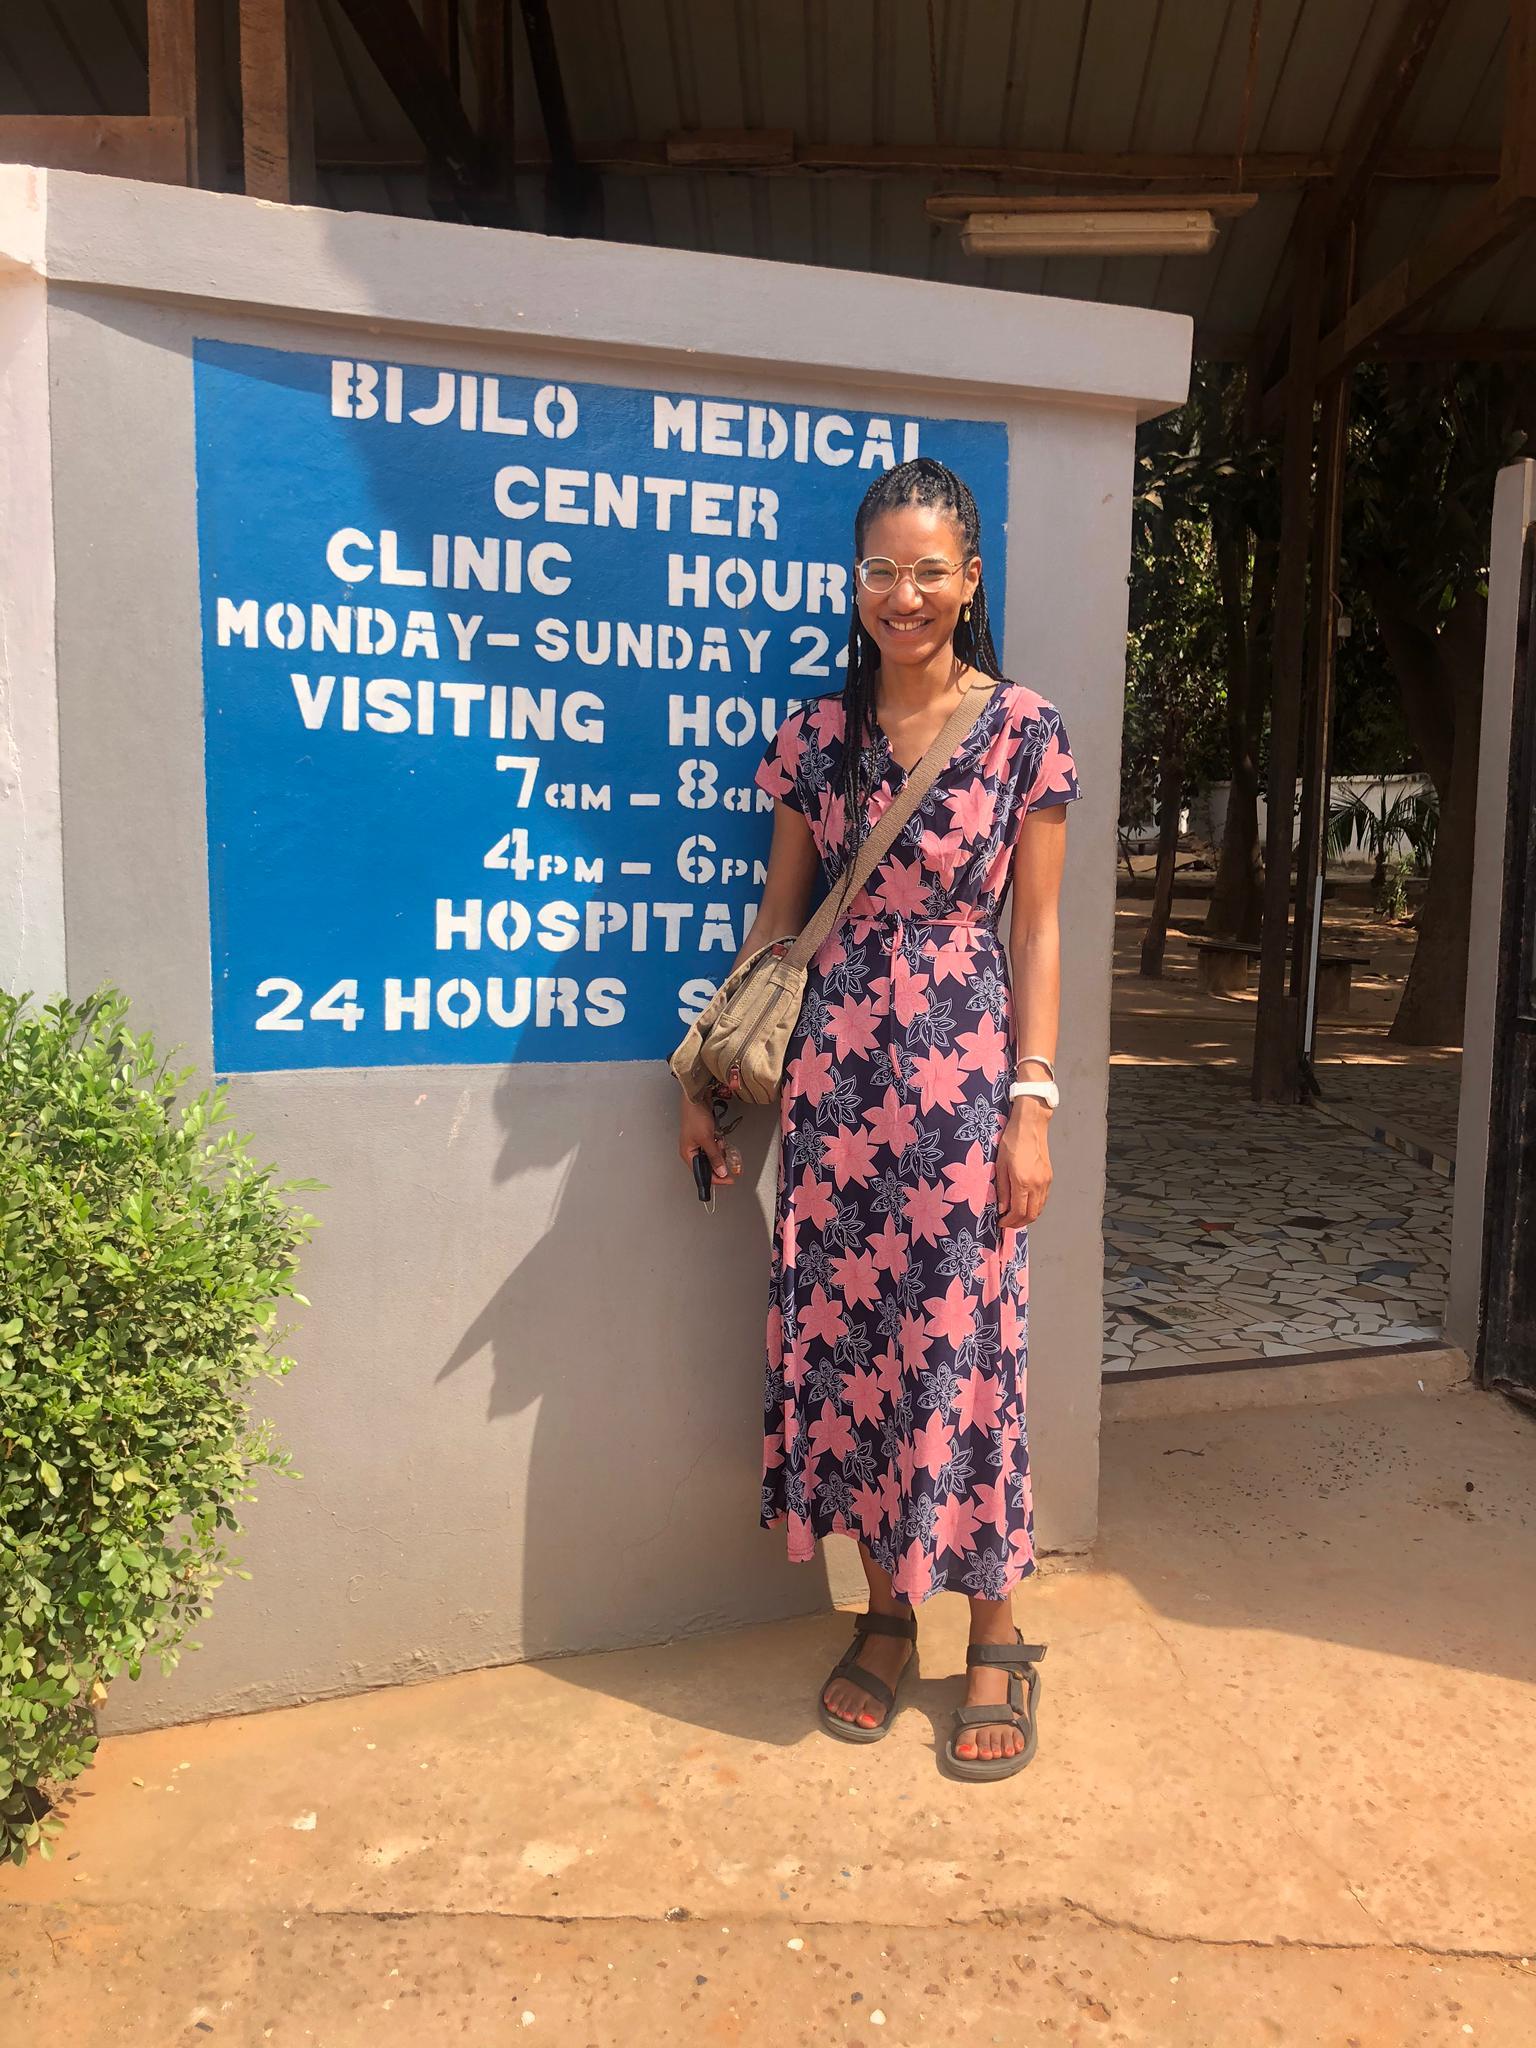 Bijilo Medical Center